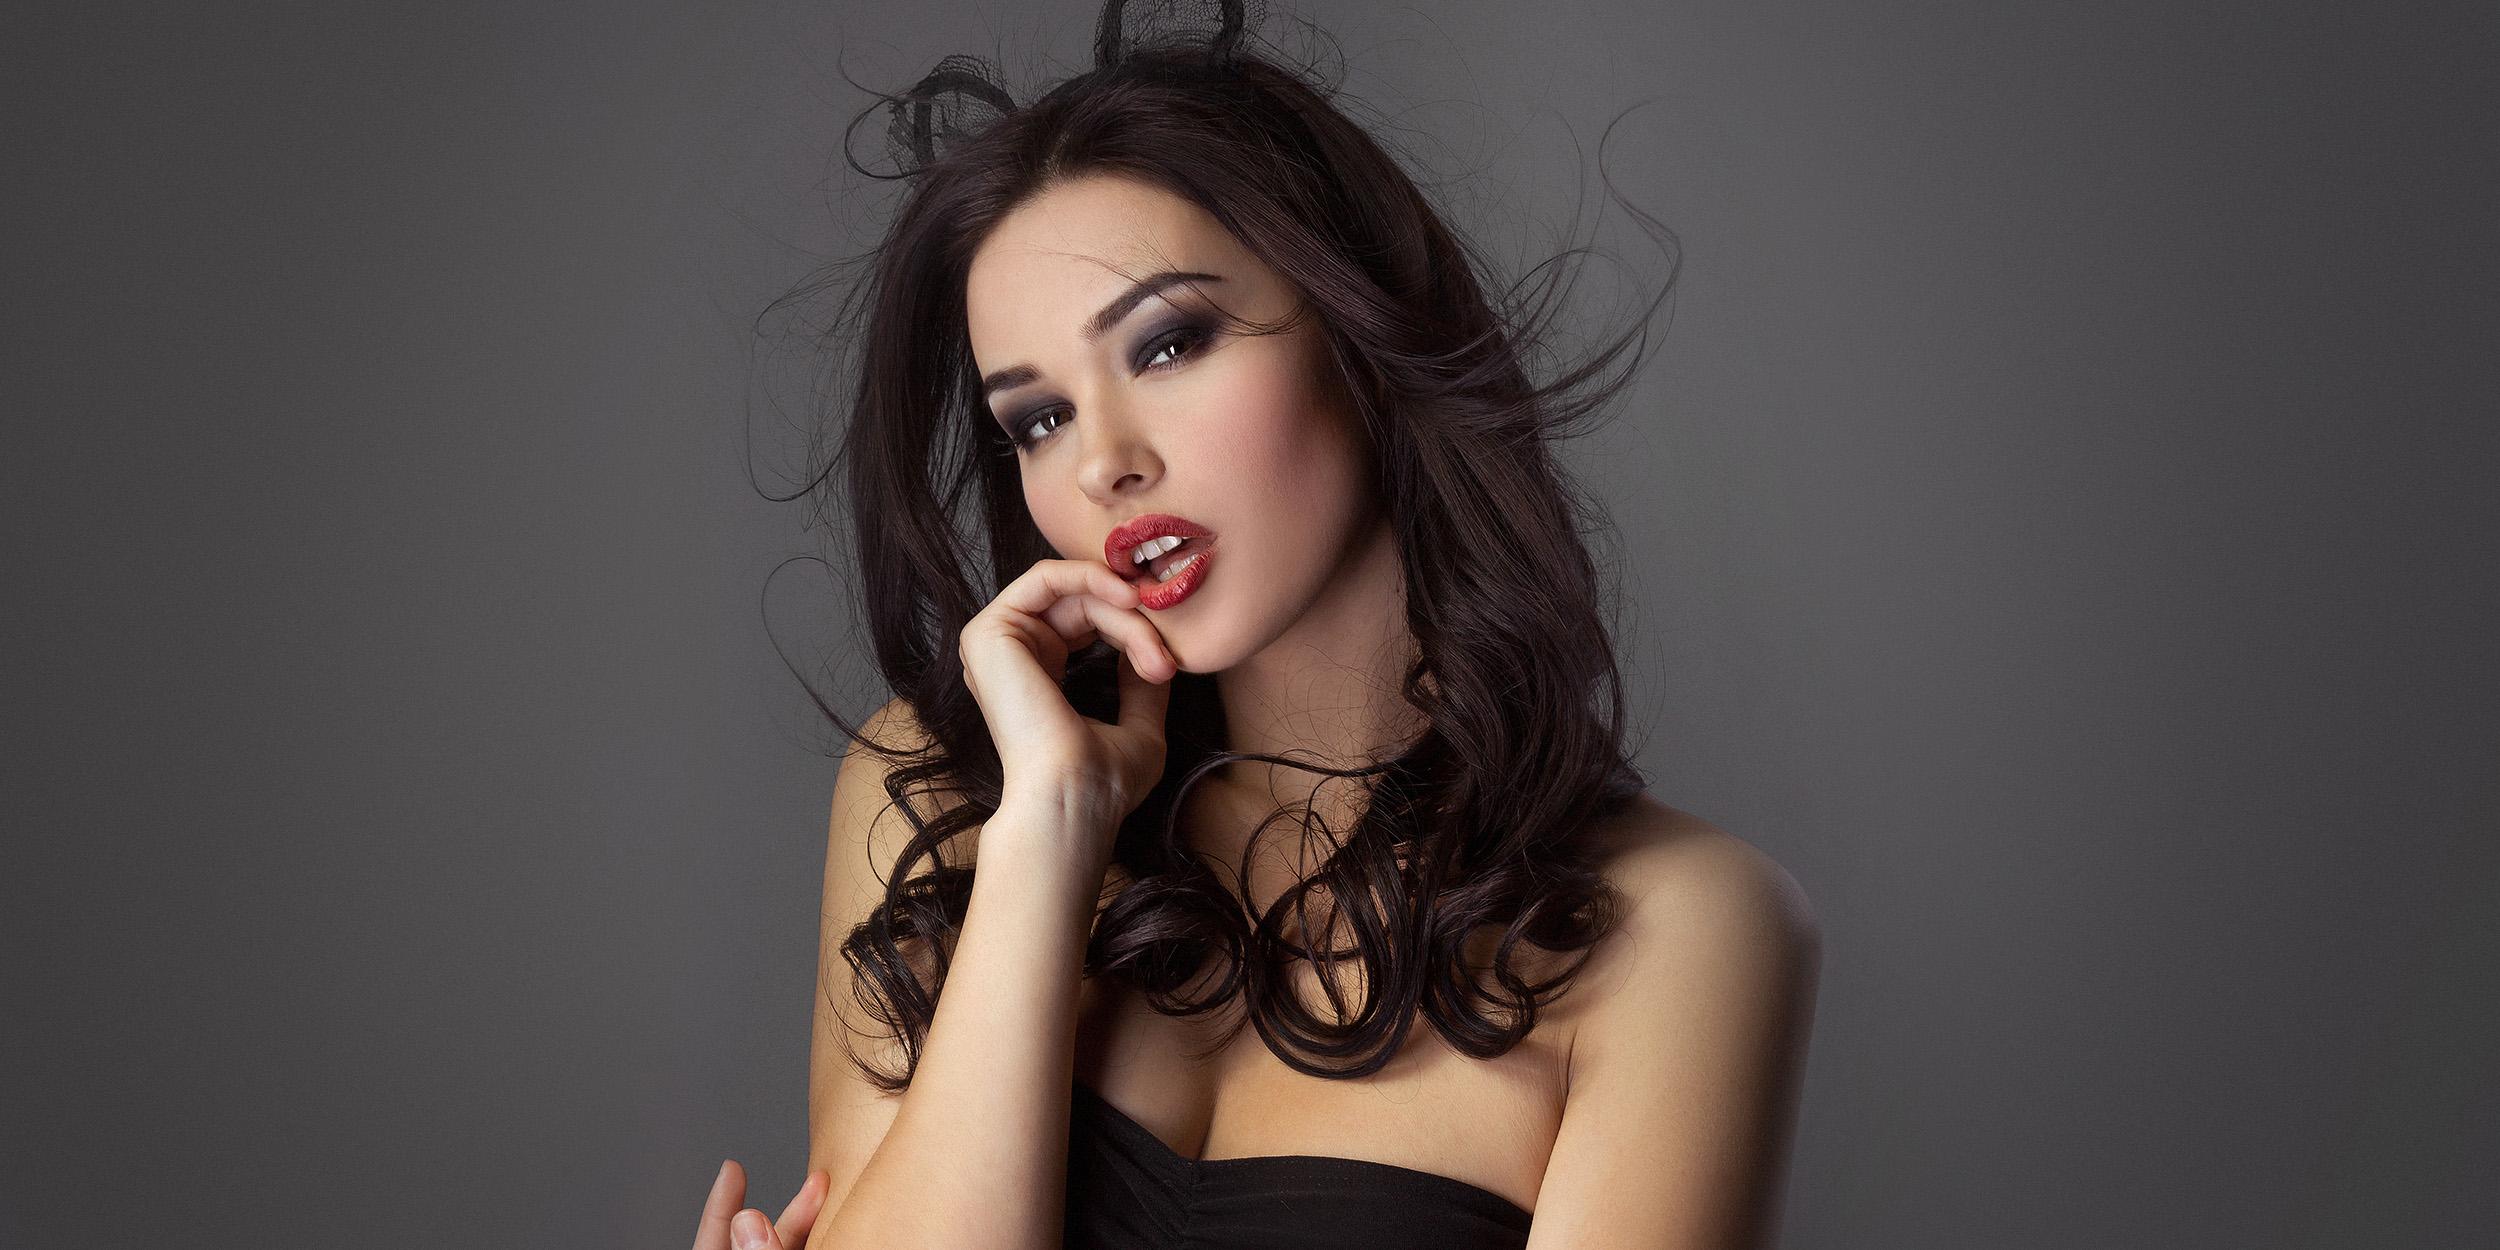 Фото девушек с вечерним макияжем